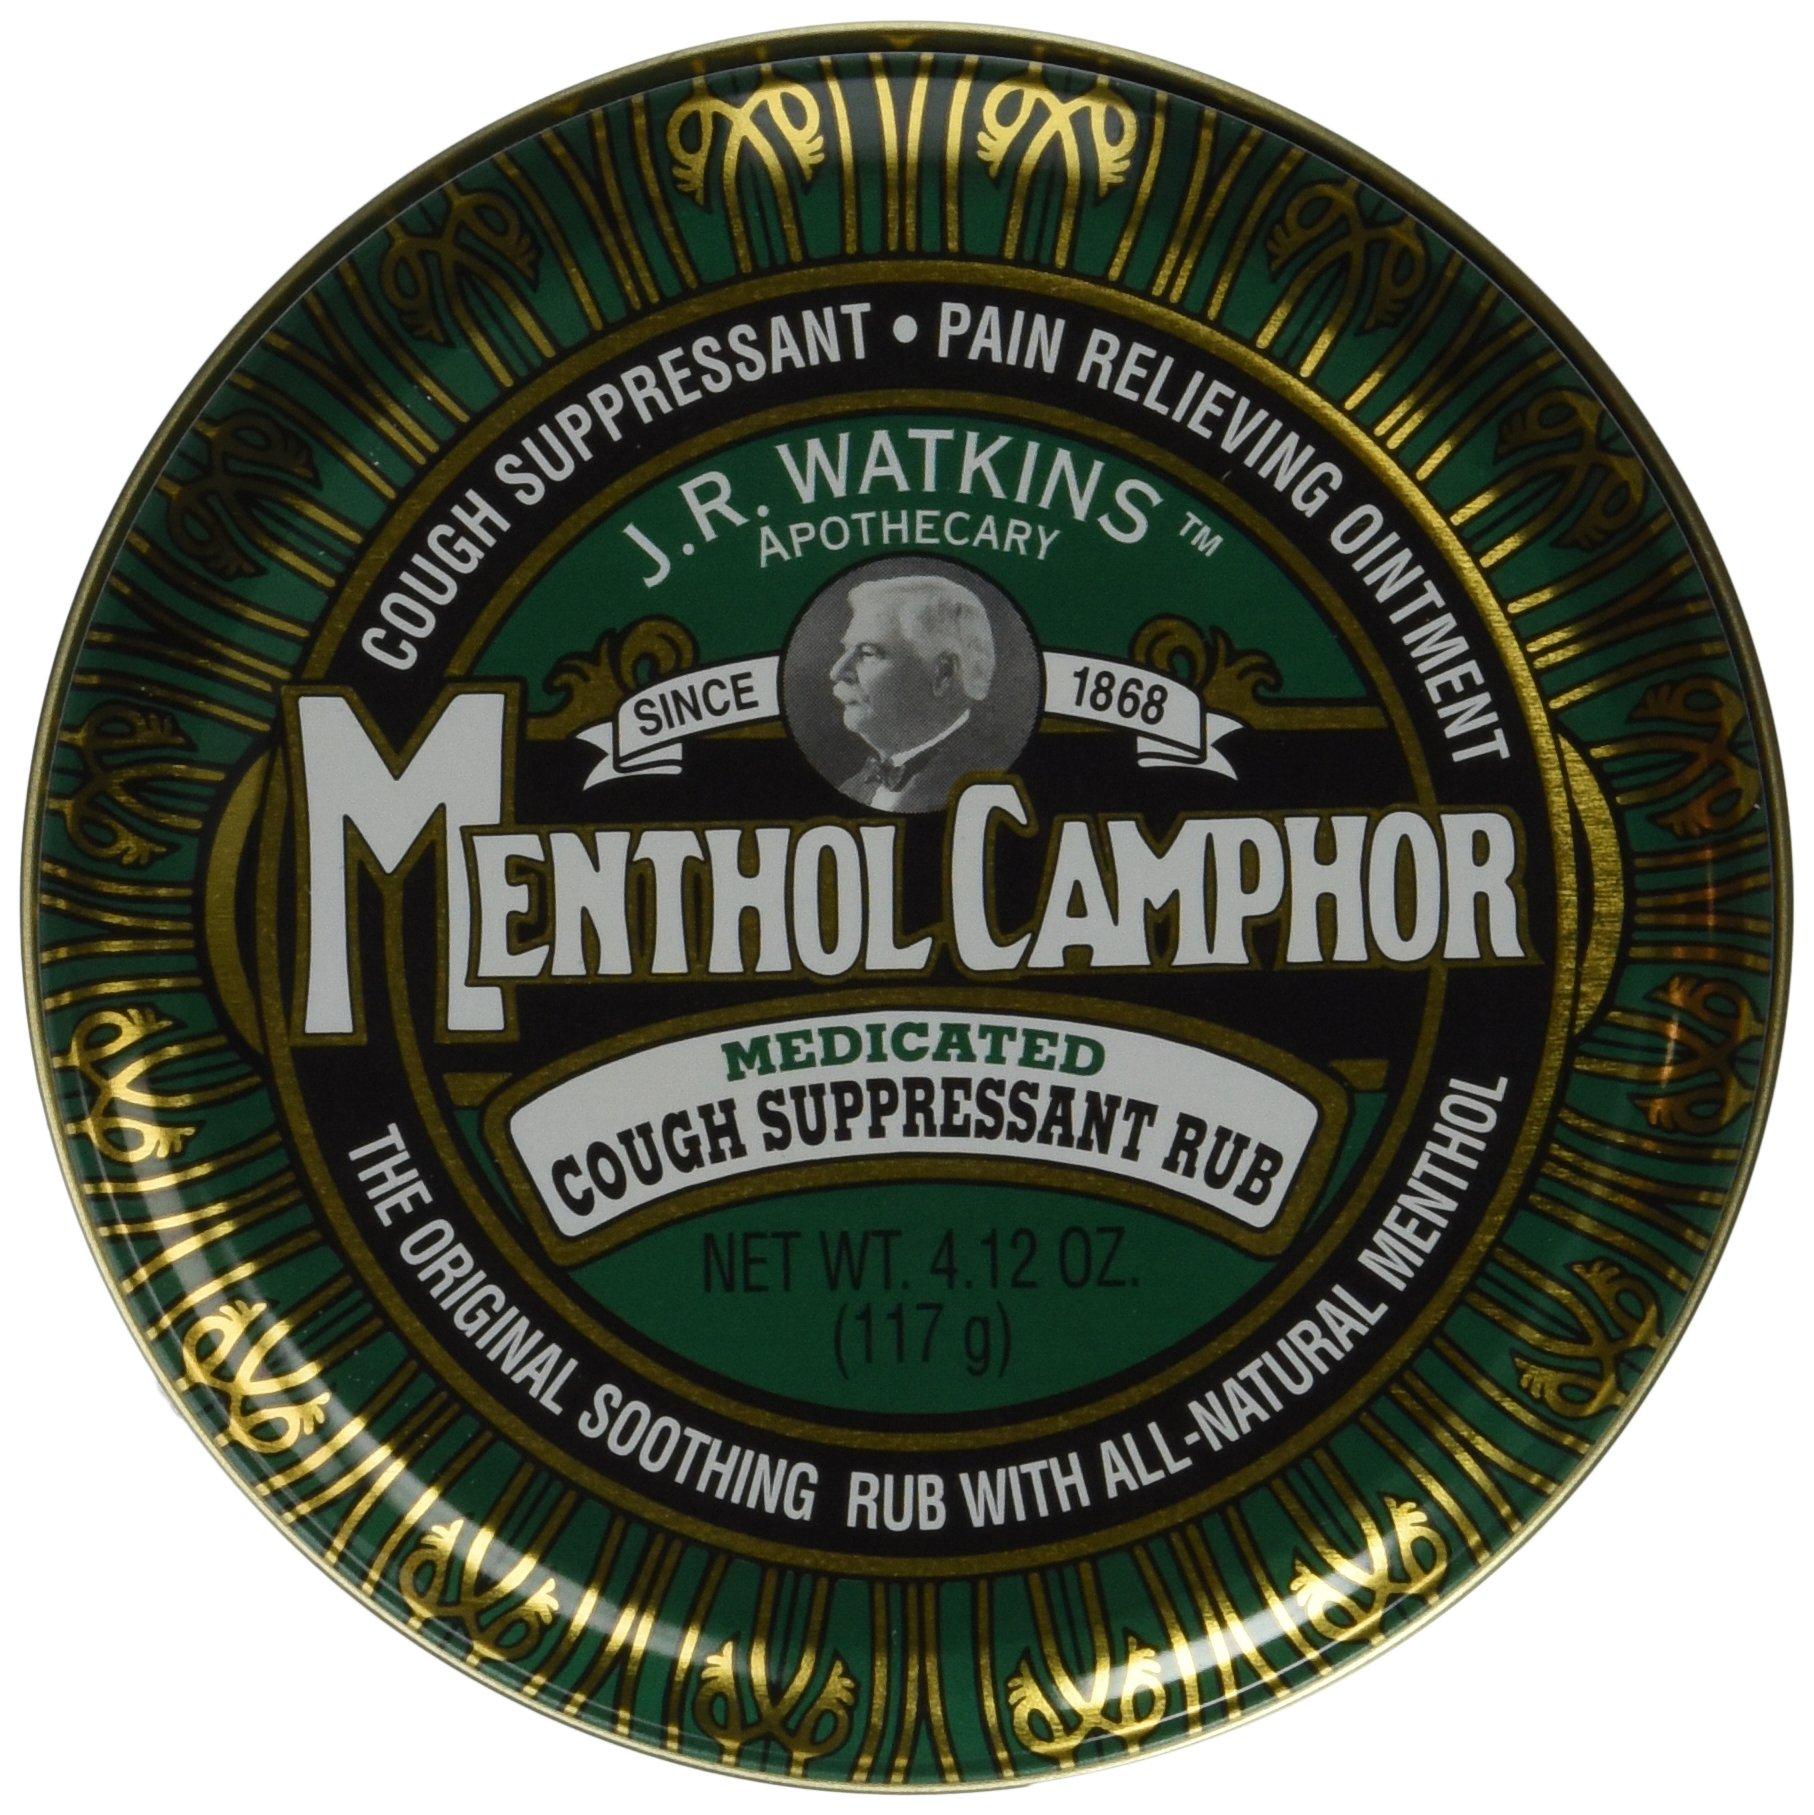 JR Watkins Original Menthol Camphor Cough Ointment/Rub 4.1 oz by J.R. Watkins